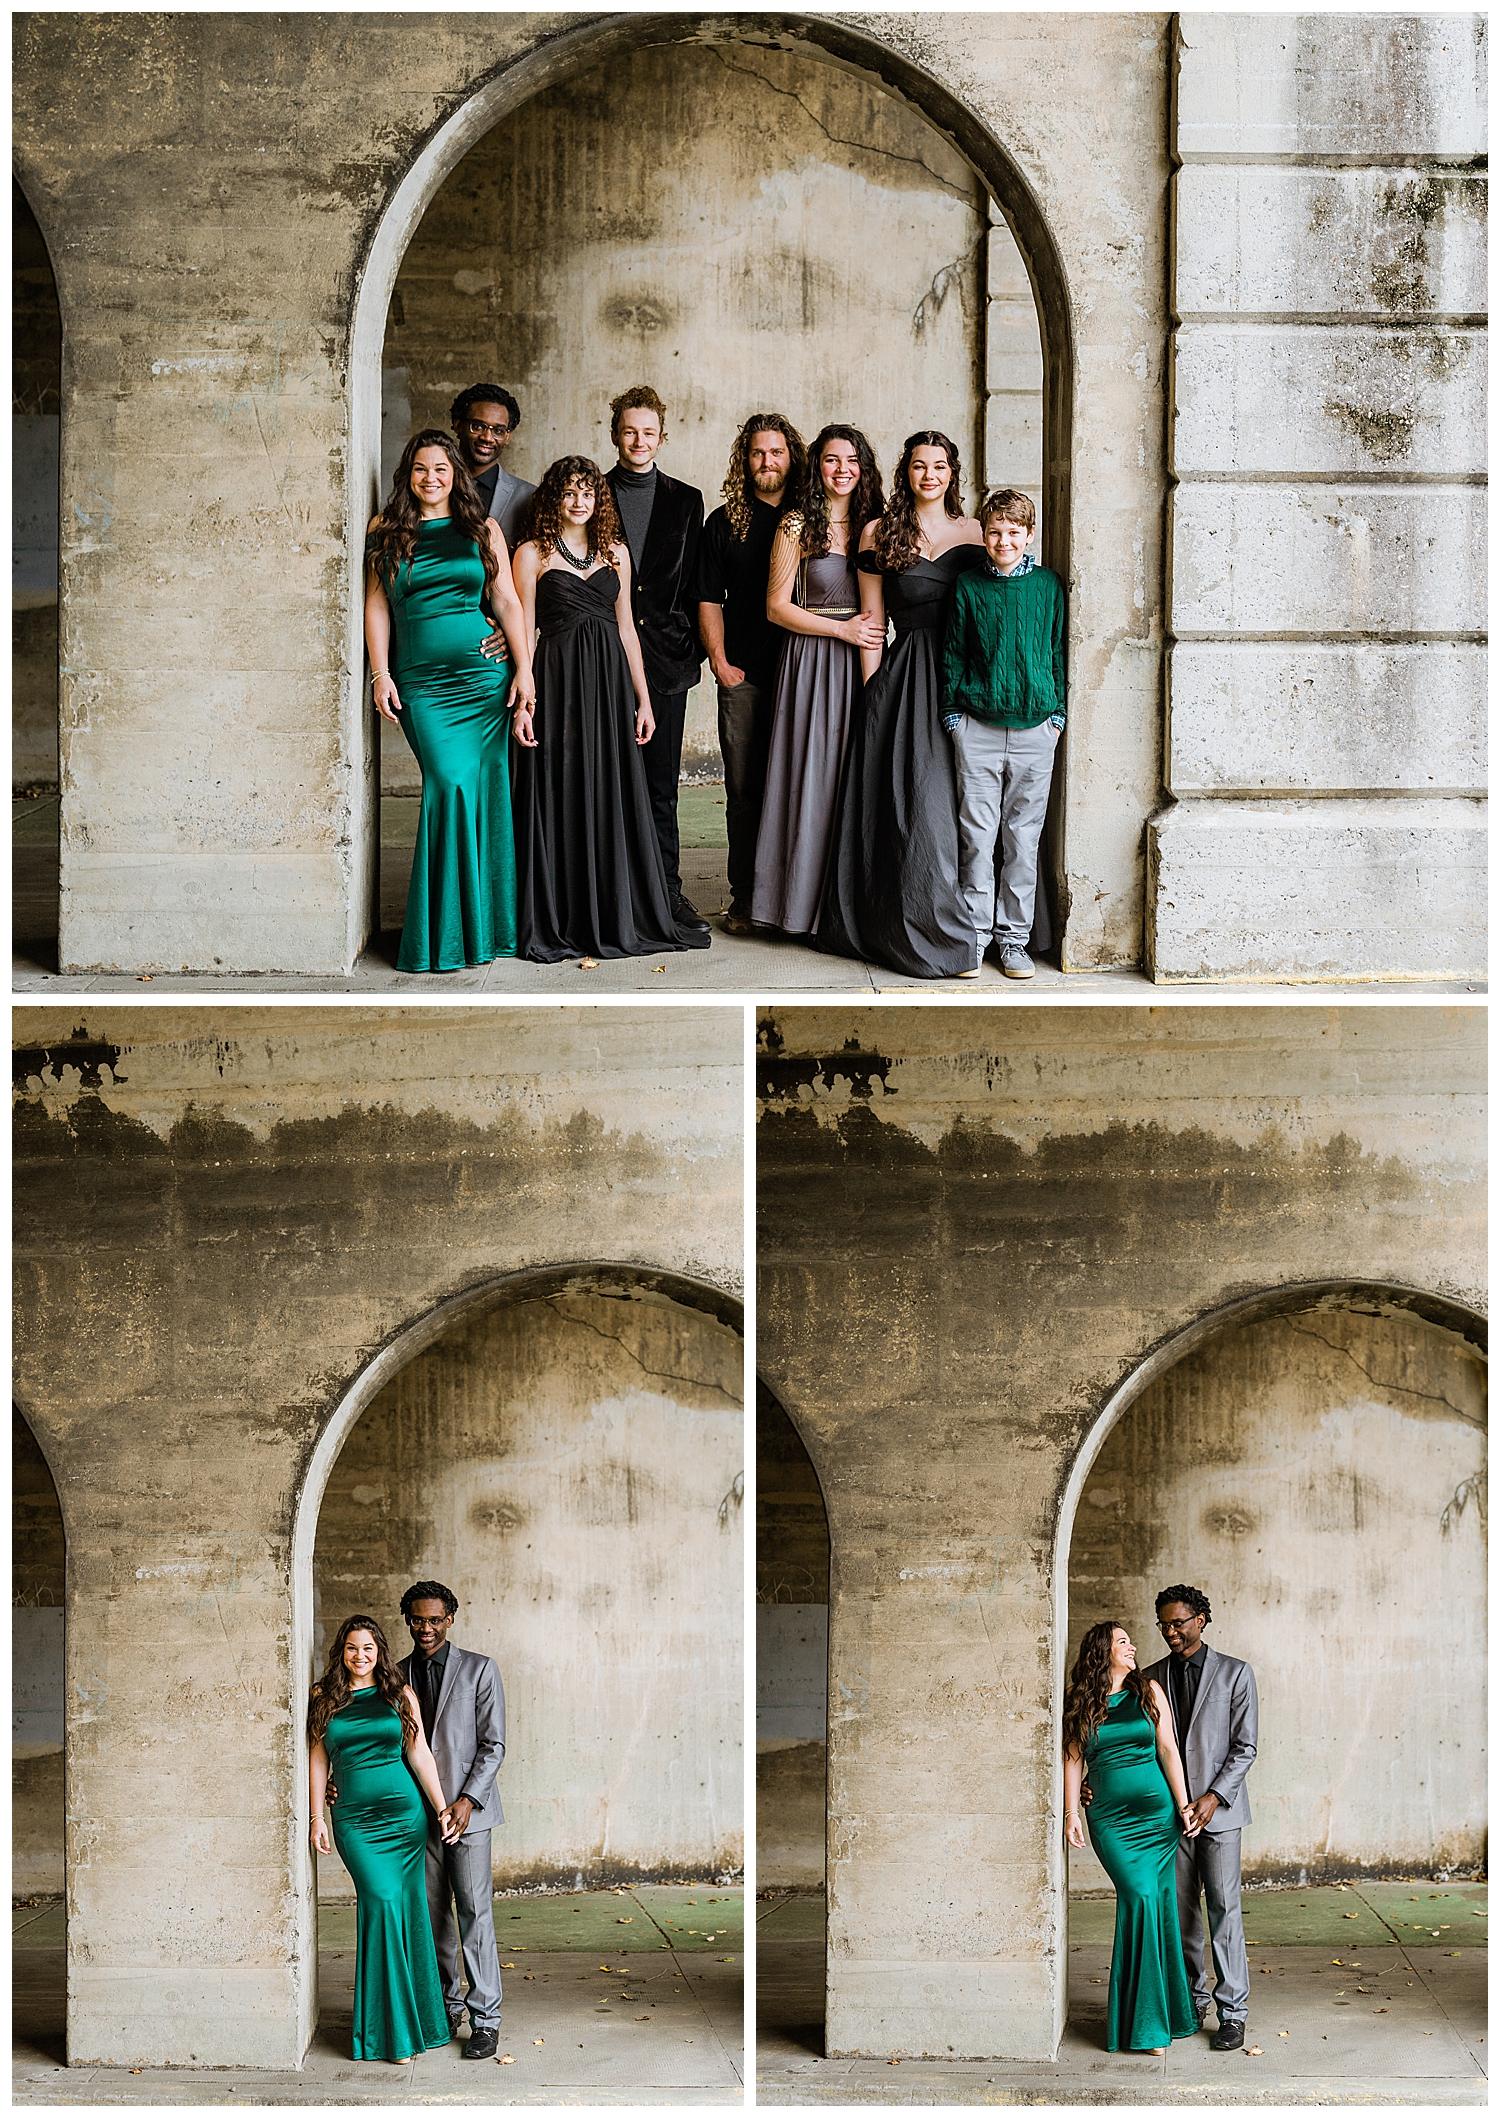 Formal Family Photos at The Macon City Auditorium